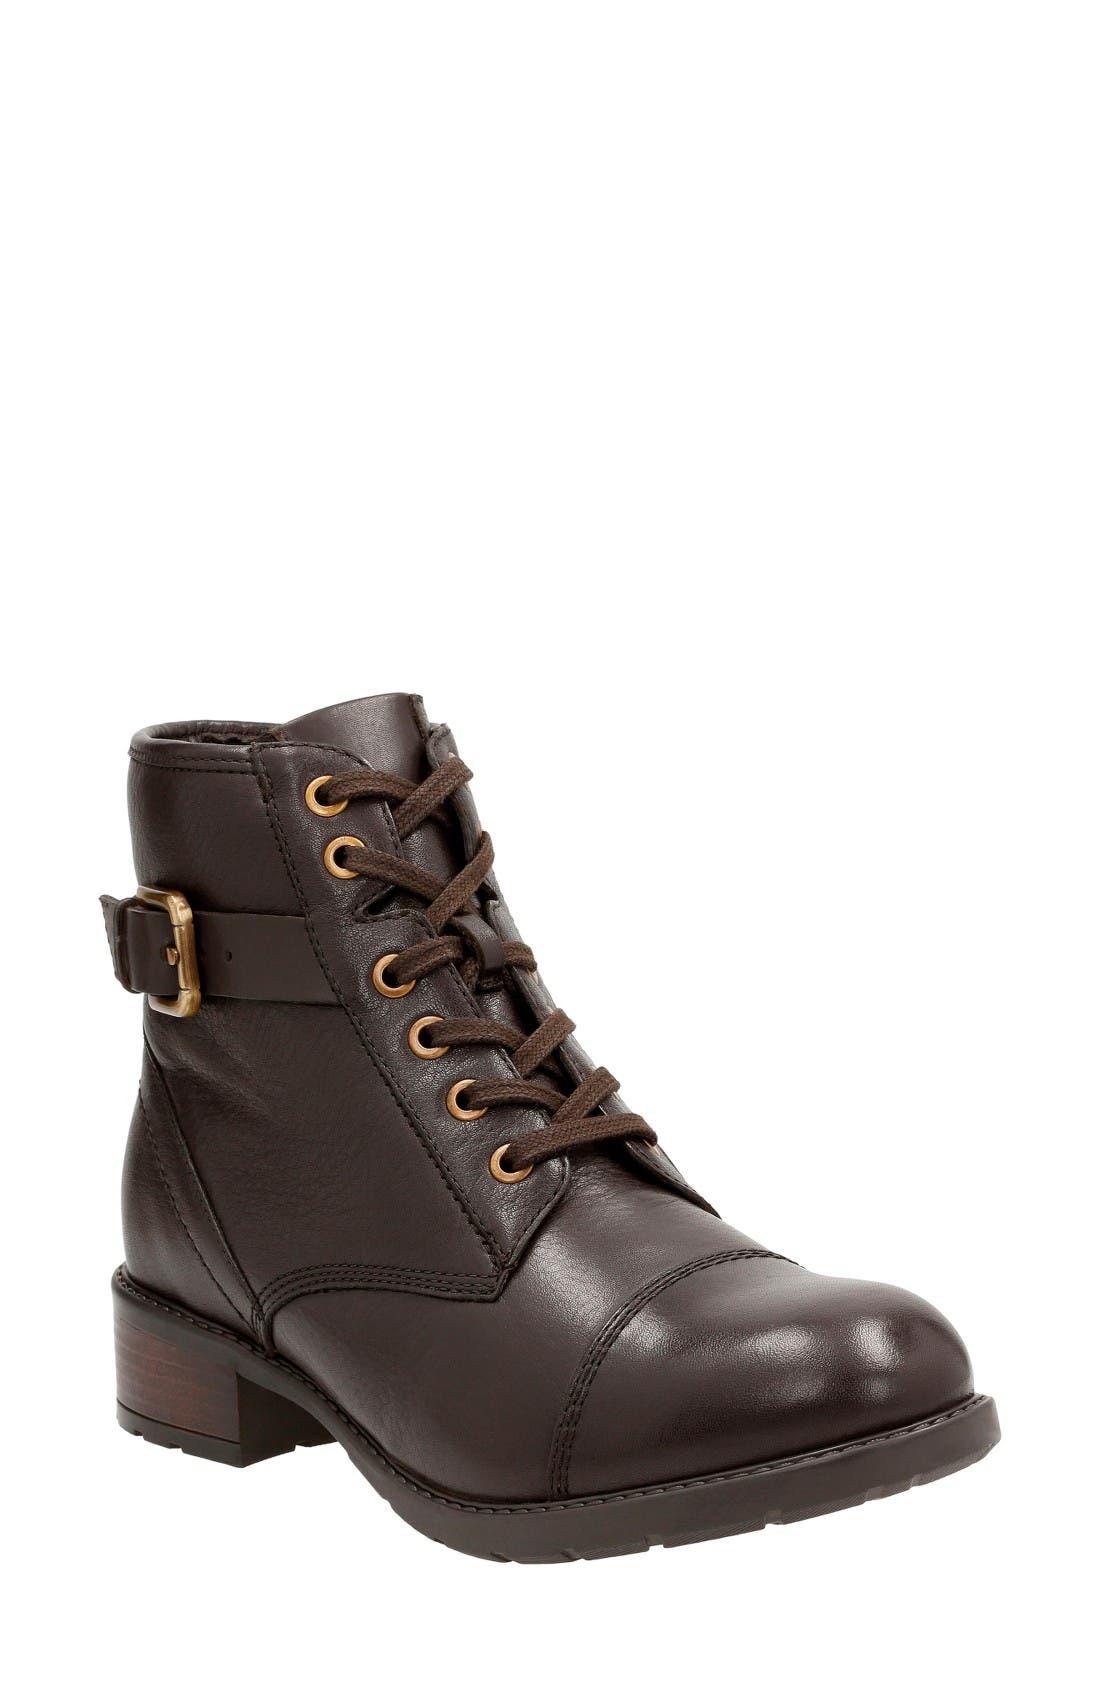 Alternate Image 1 Selected - Clarks® 'Swansea Ledge' Waterproof Moto Boot (Women)